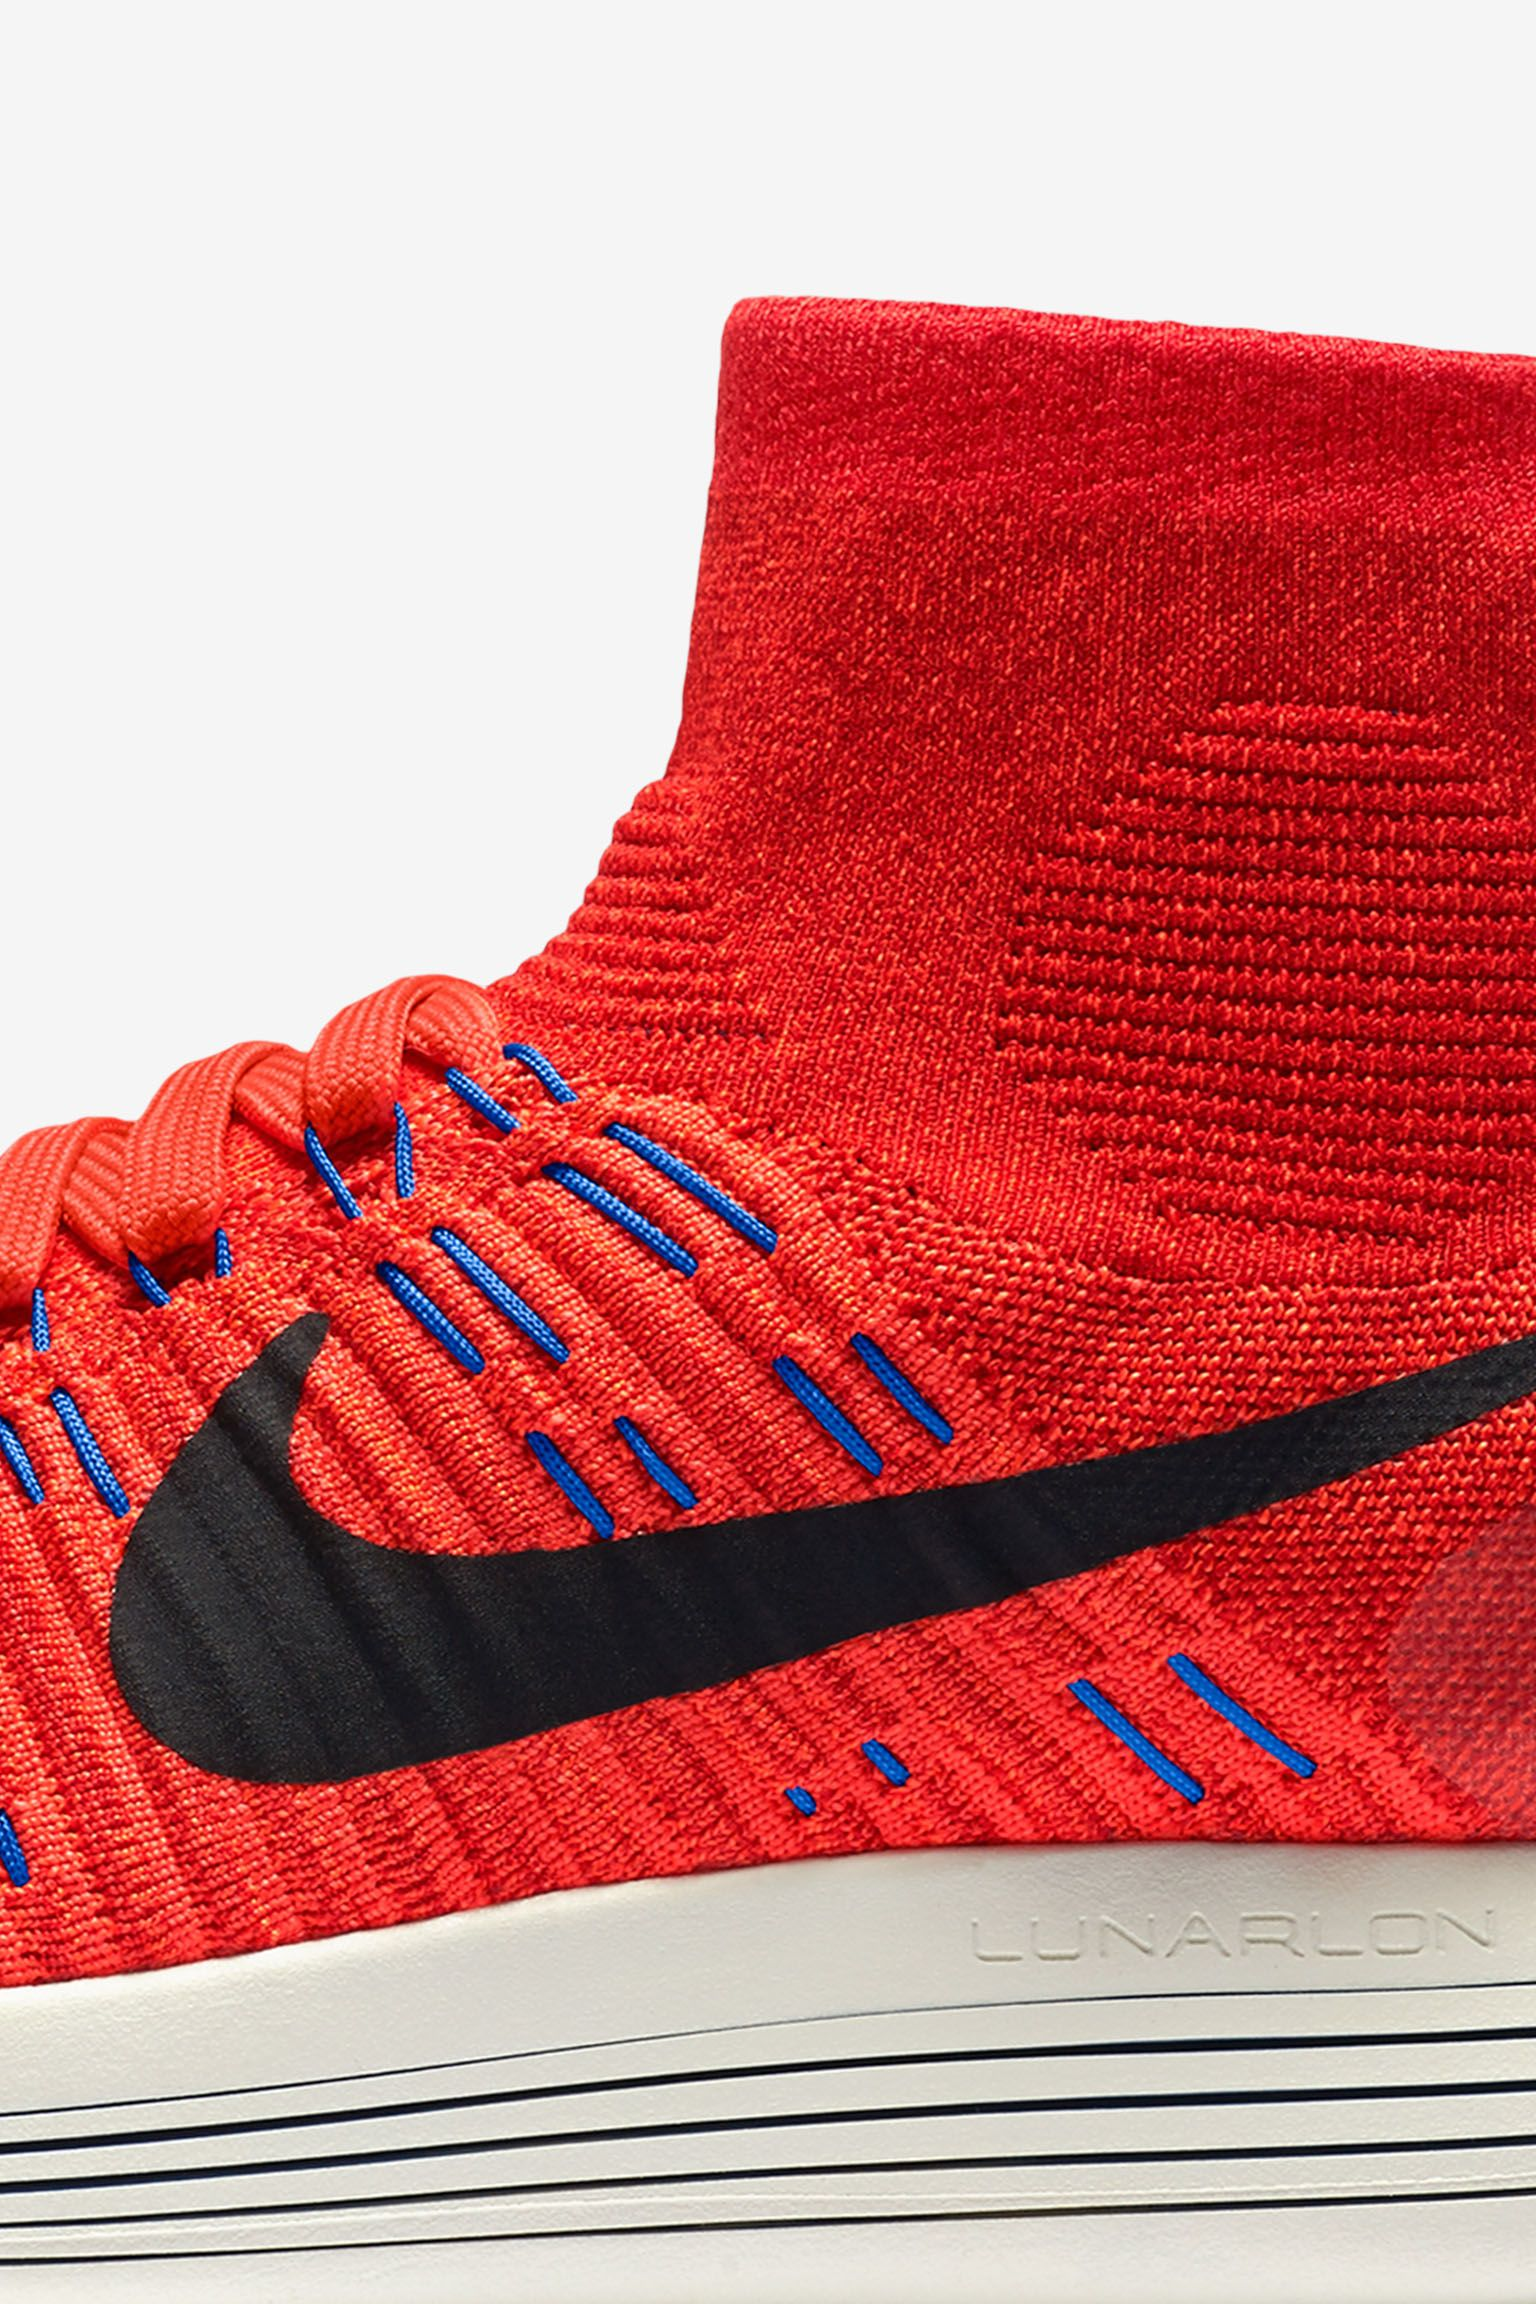 Nike LunarEpic Flyknit 'University Red'